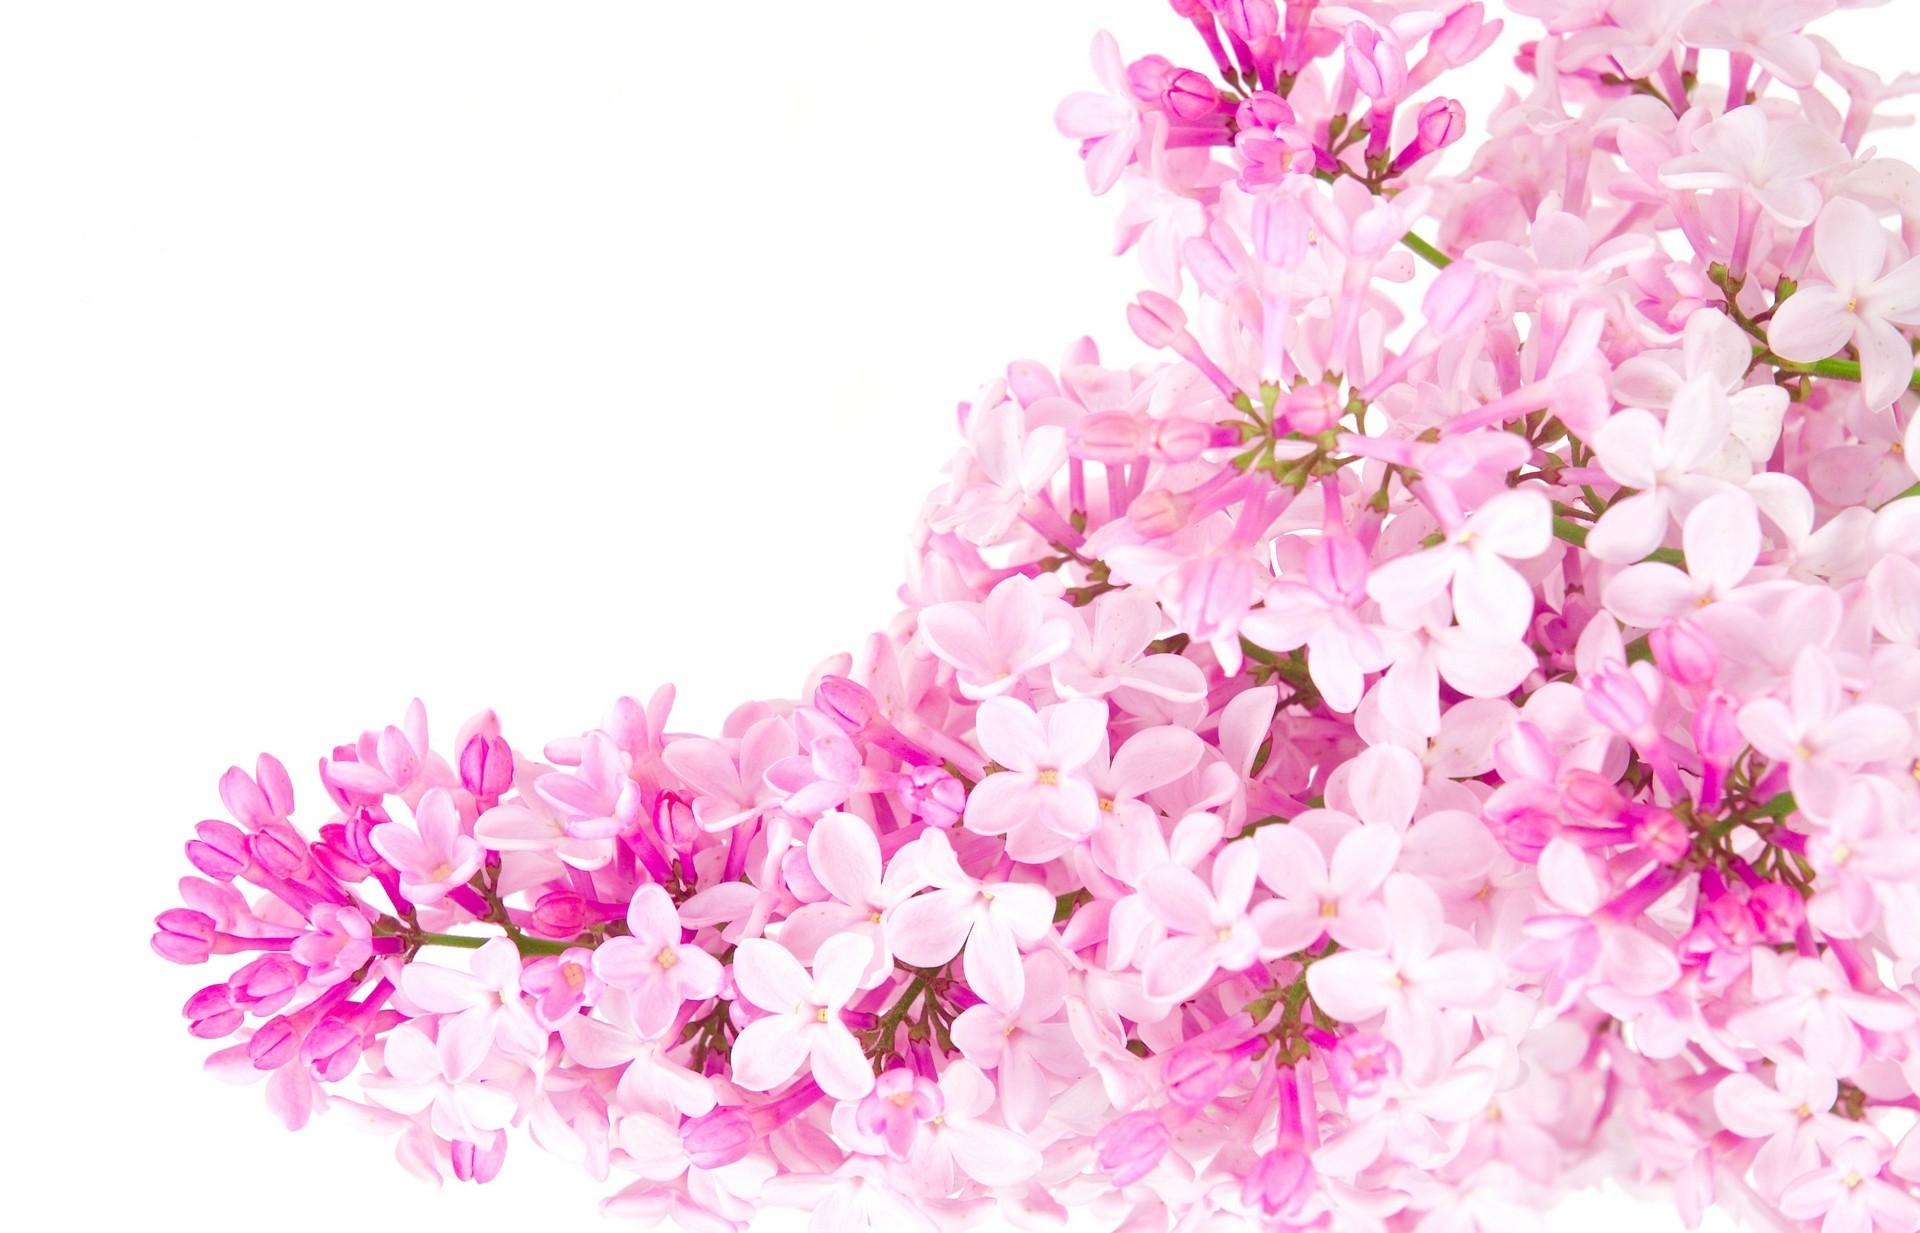 Flower Wallpaper Tumblr HBC Images About Flowers On Pinterest Samsung Vintage Phone 1920x1233